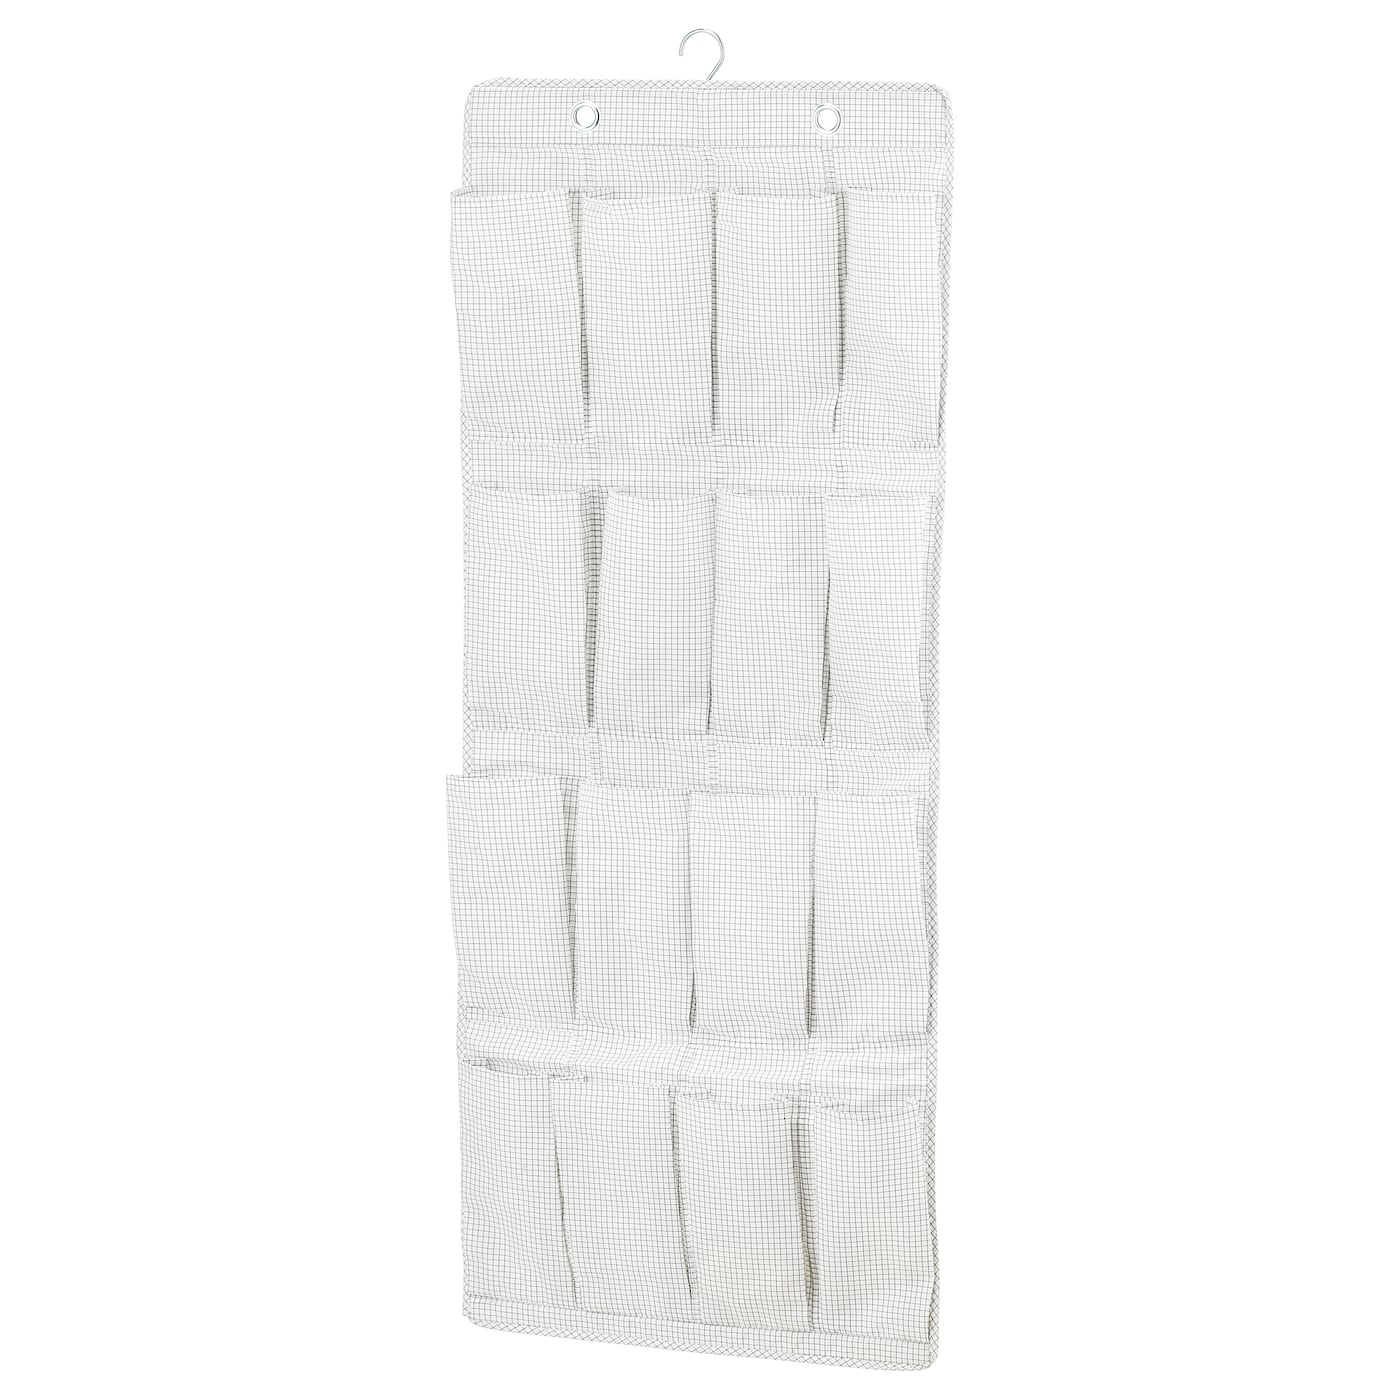 IKEA STUK Hängeaufbewahrung 16 Fächer